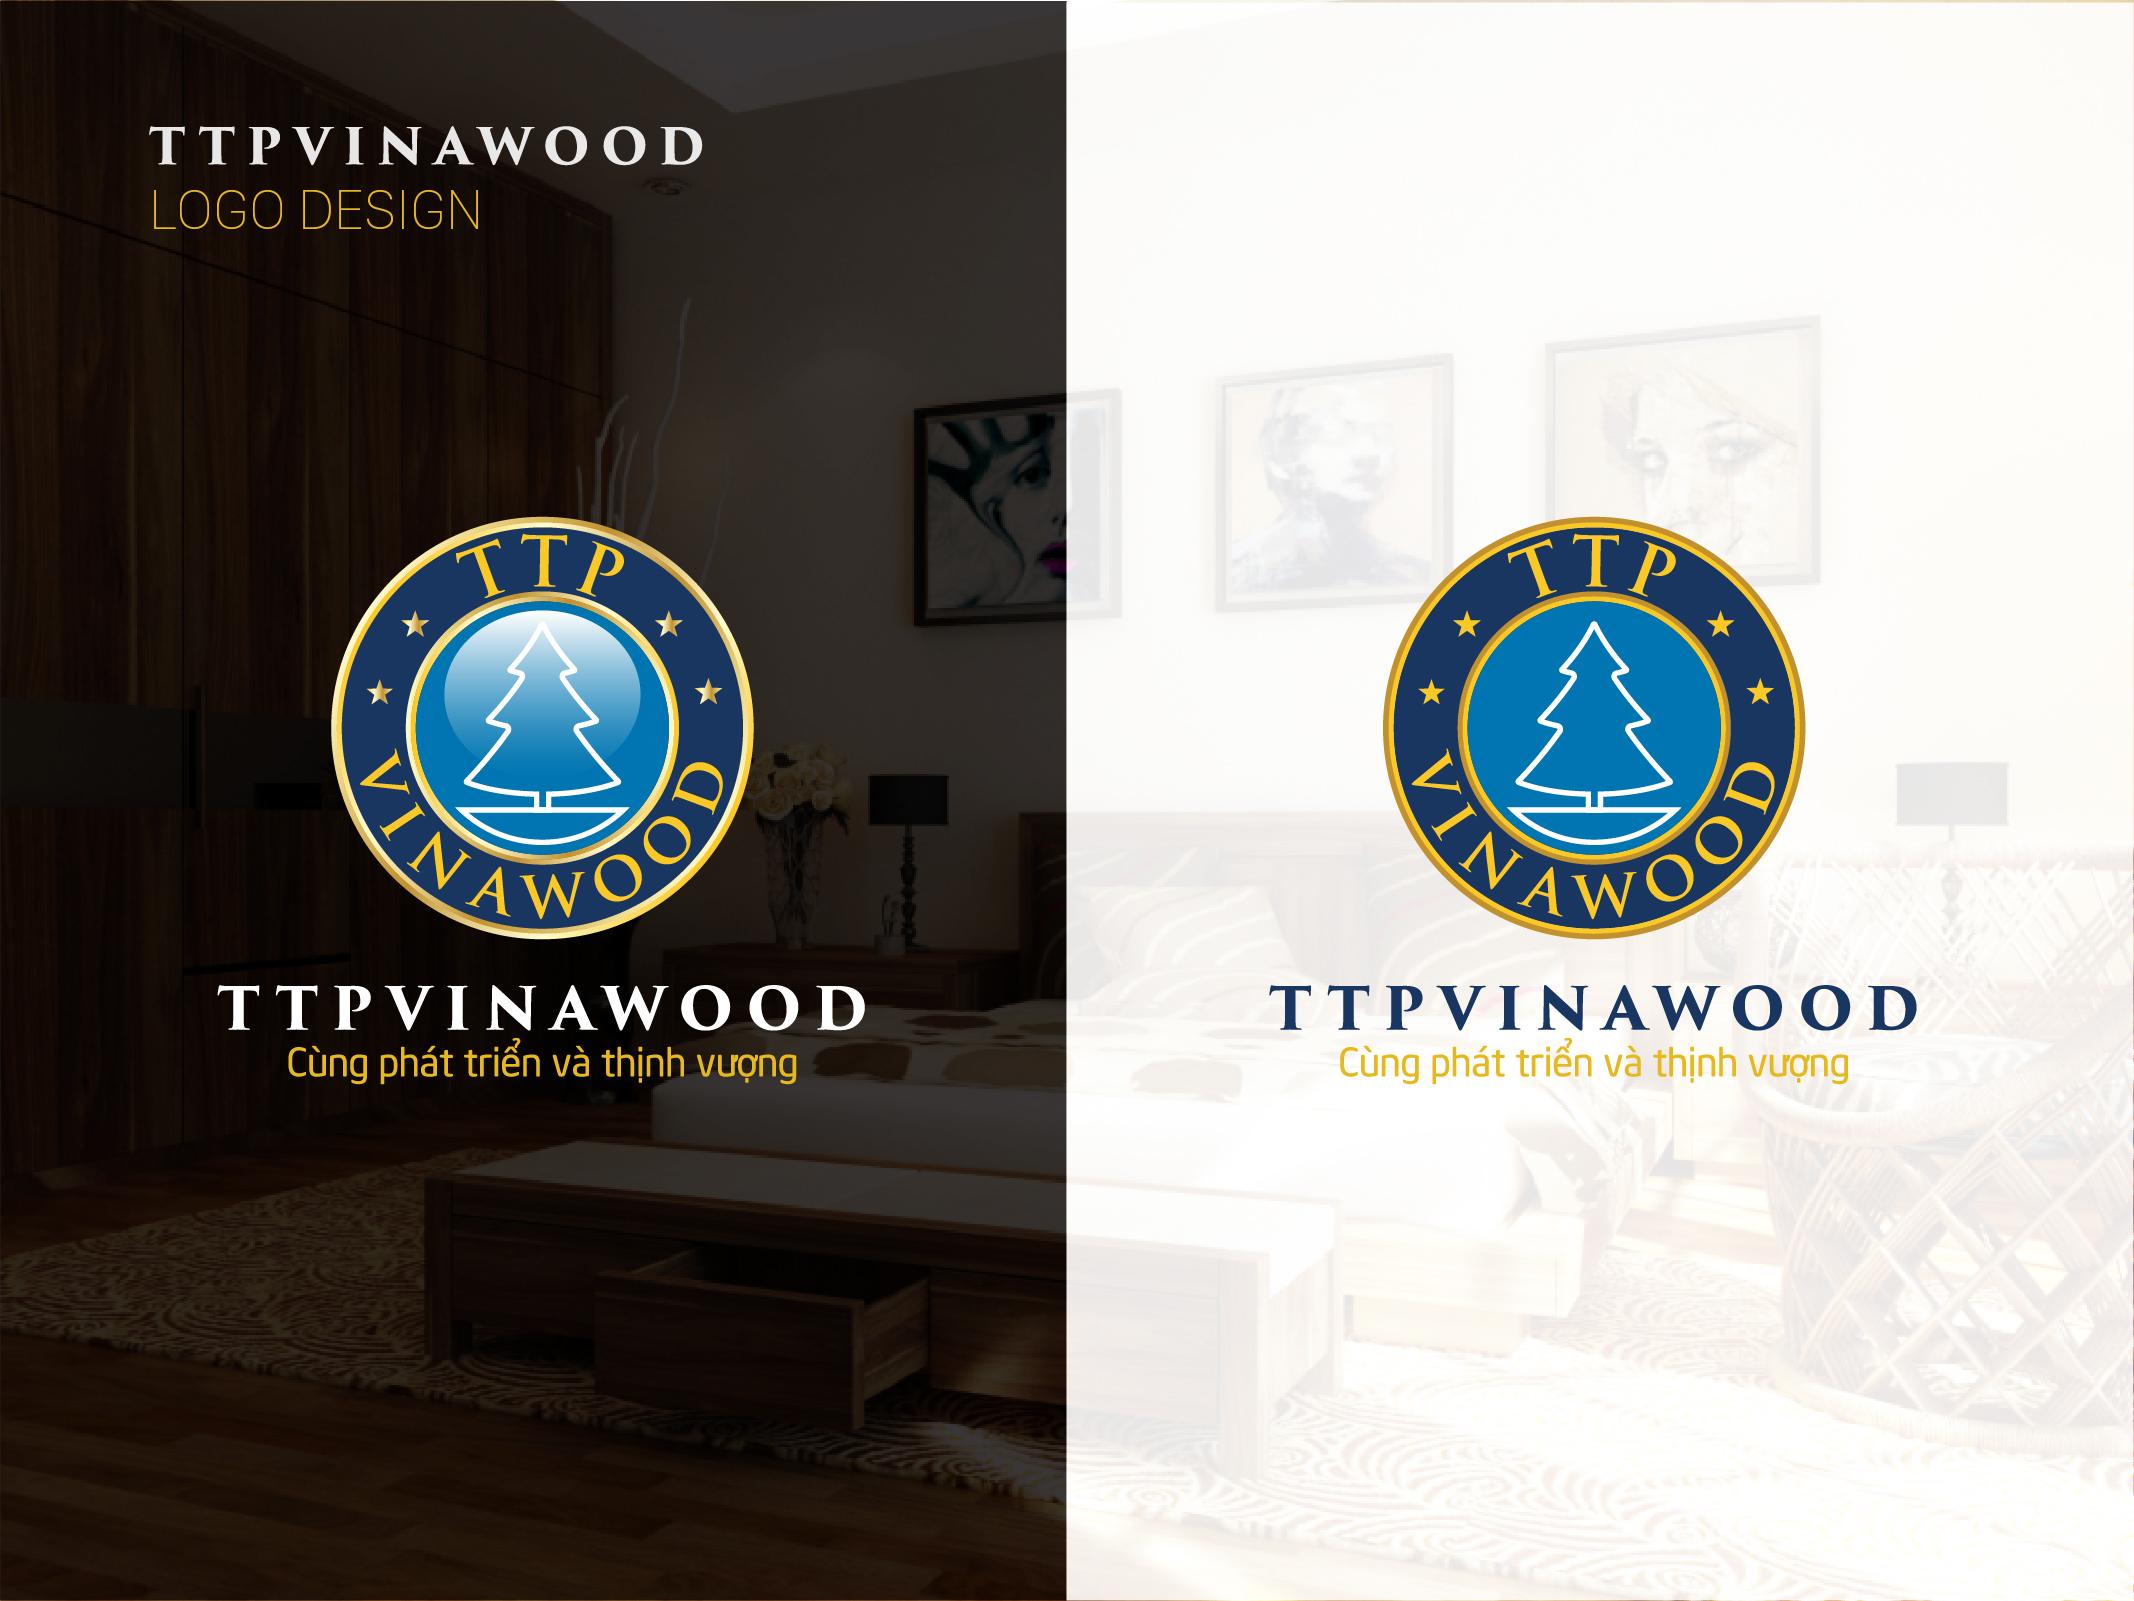 Thiet ke logo TTP vinawood-02